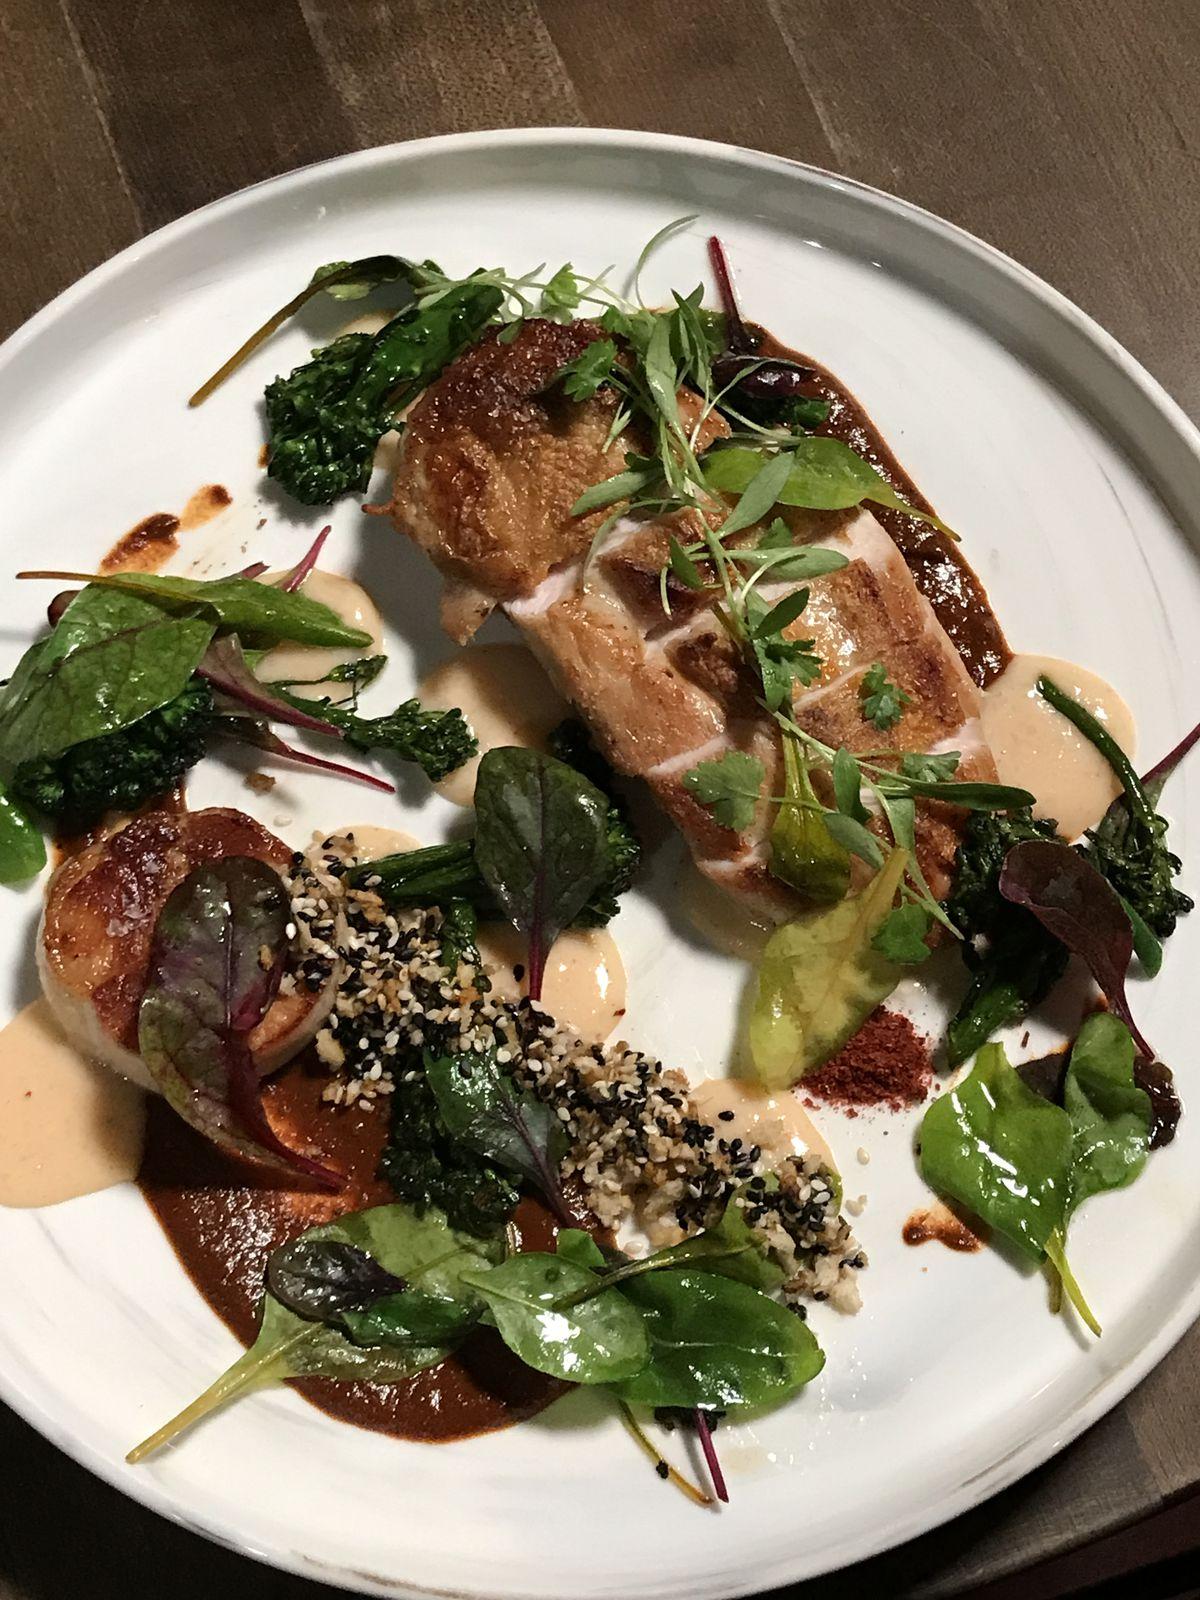 A dinner entree at Band of Bohemia restaurant in Ravenswood.   Ji Suk Yi/Sun-Times